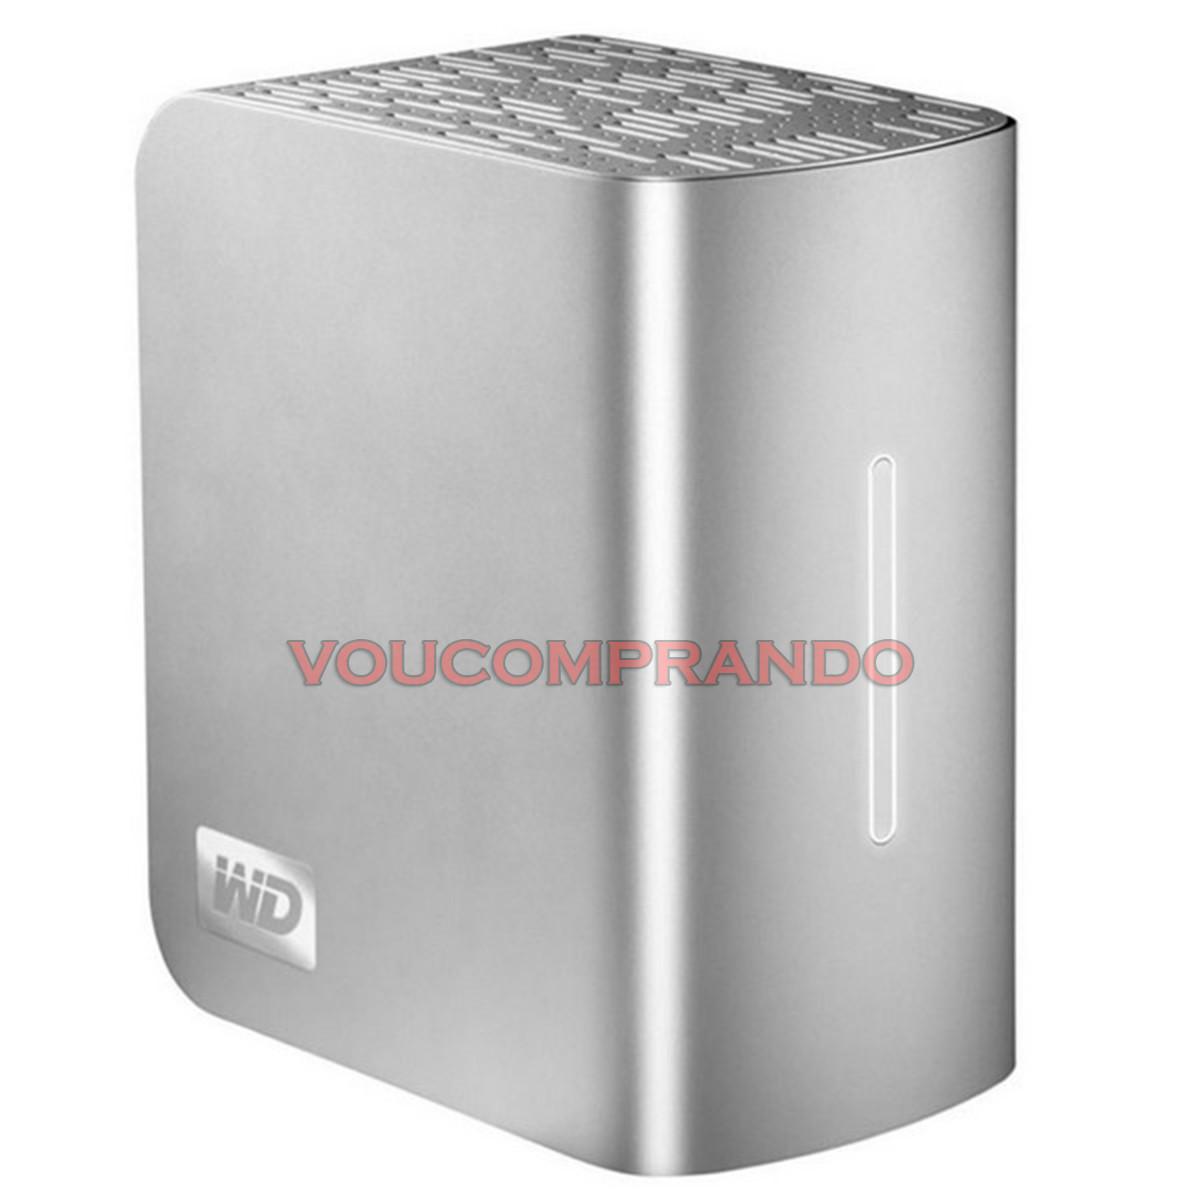 https://images.comunidades.net/vou/voucomprando/VOUCOMPRANDO_Western_Digital_My_Book_Studio_Edition_II_4TB_USB_2.jpg